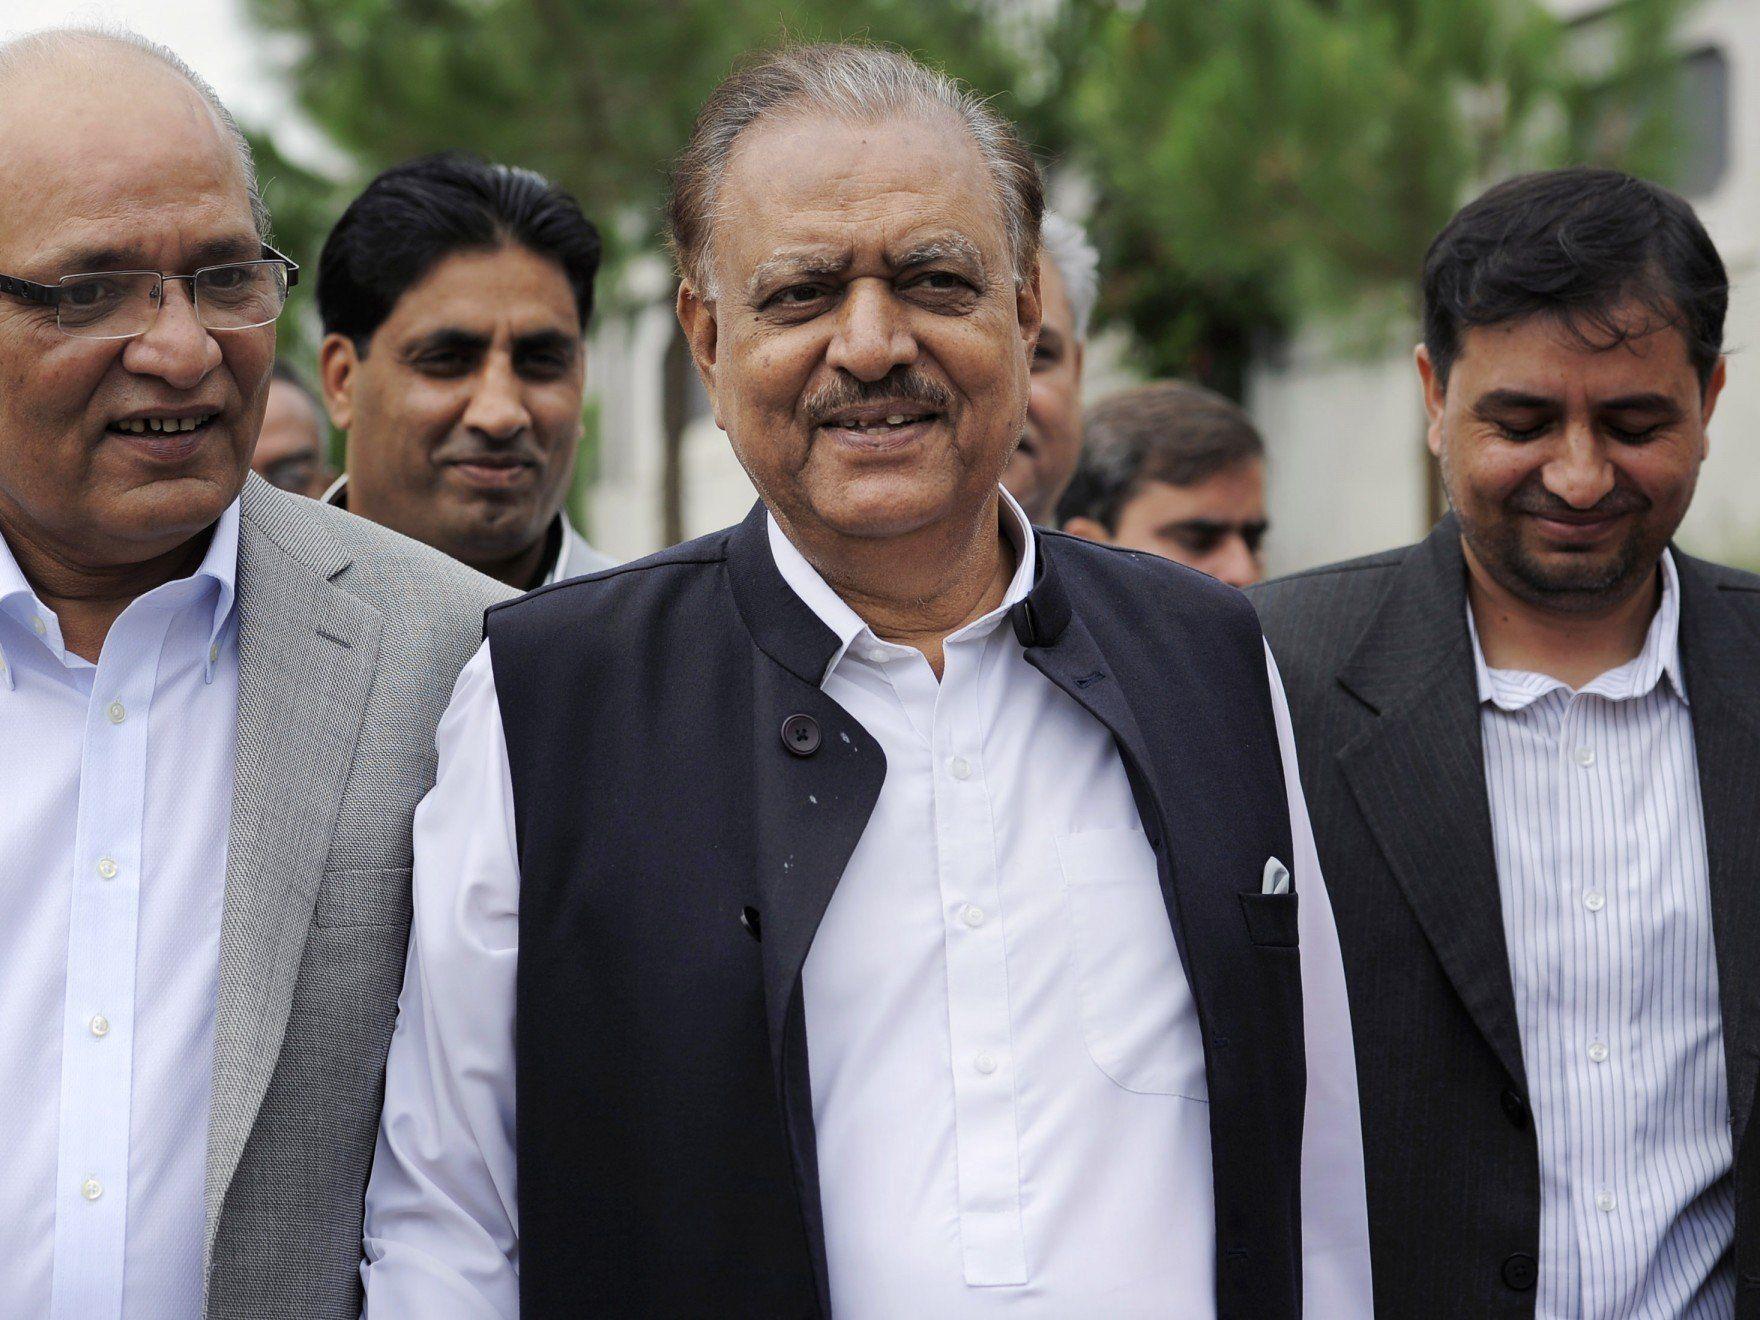 Mamnoon Hussain ist neuer pakistanischer Präsident.